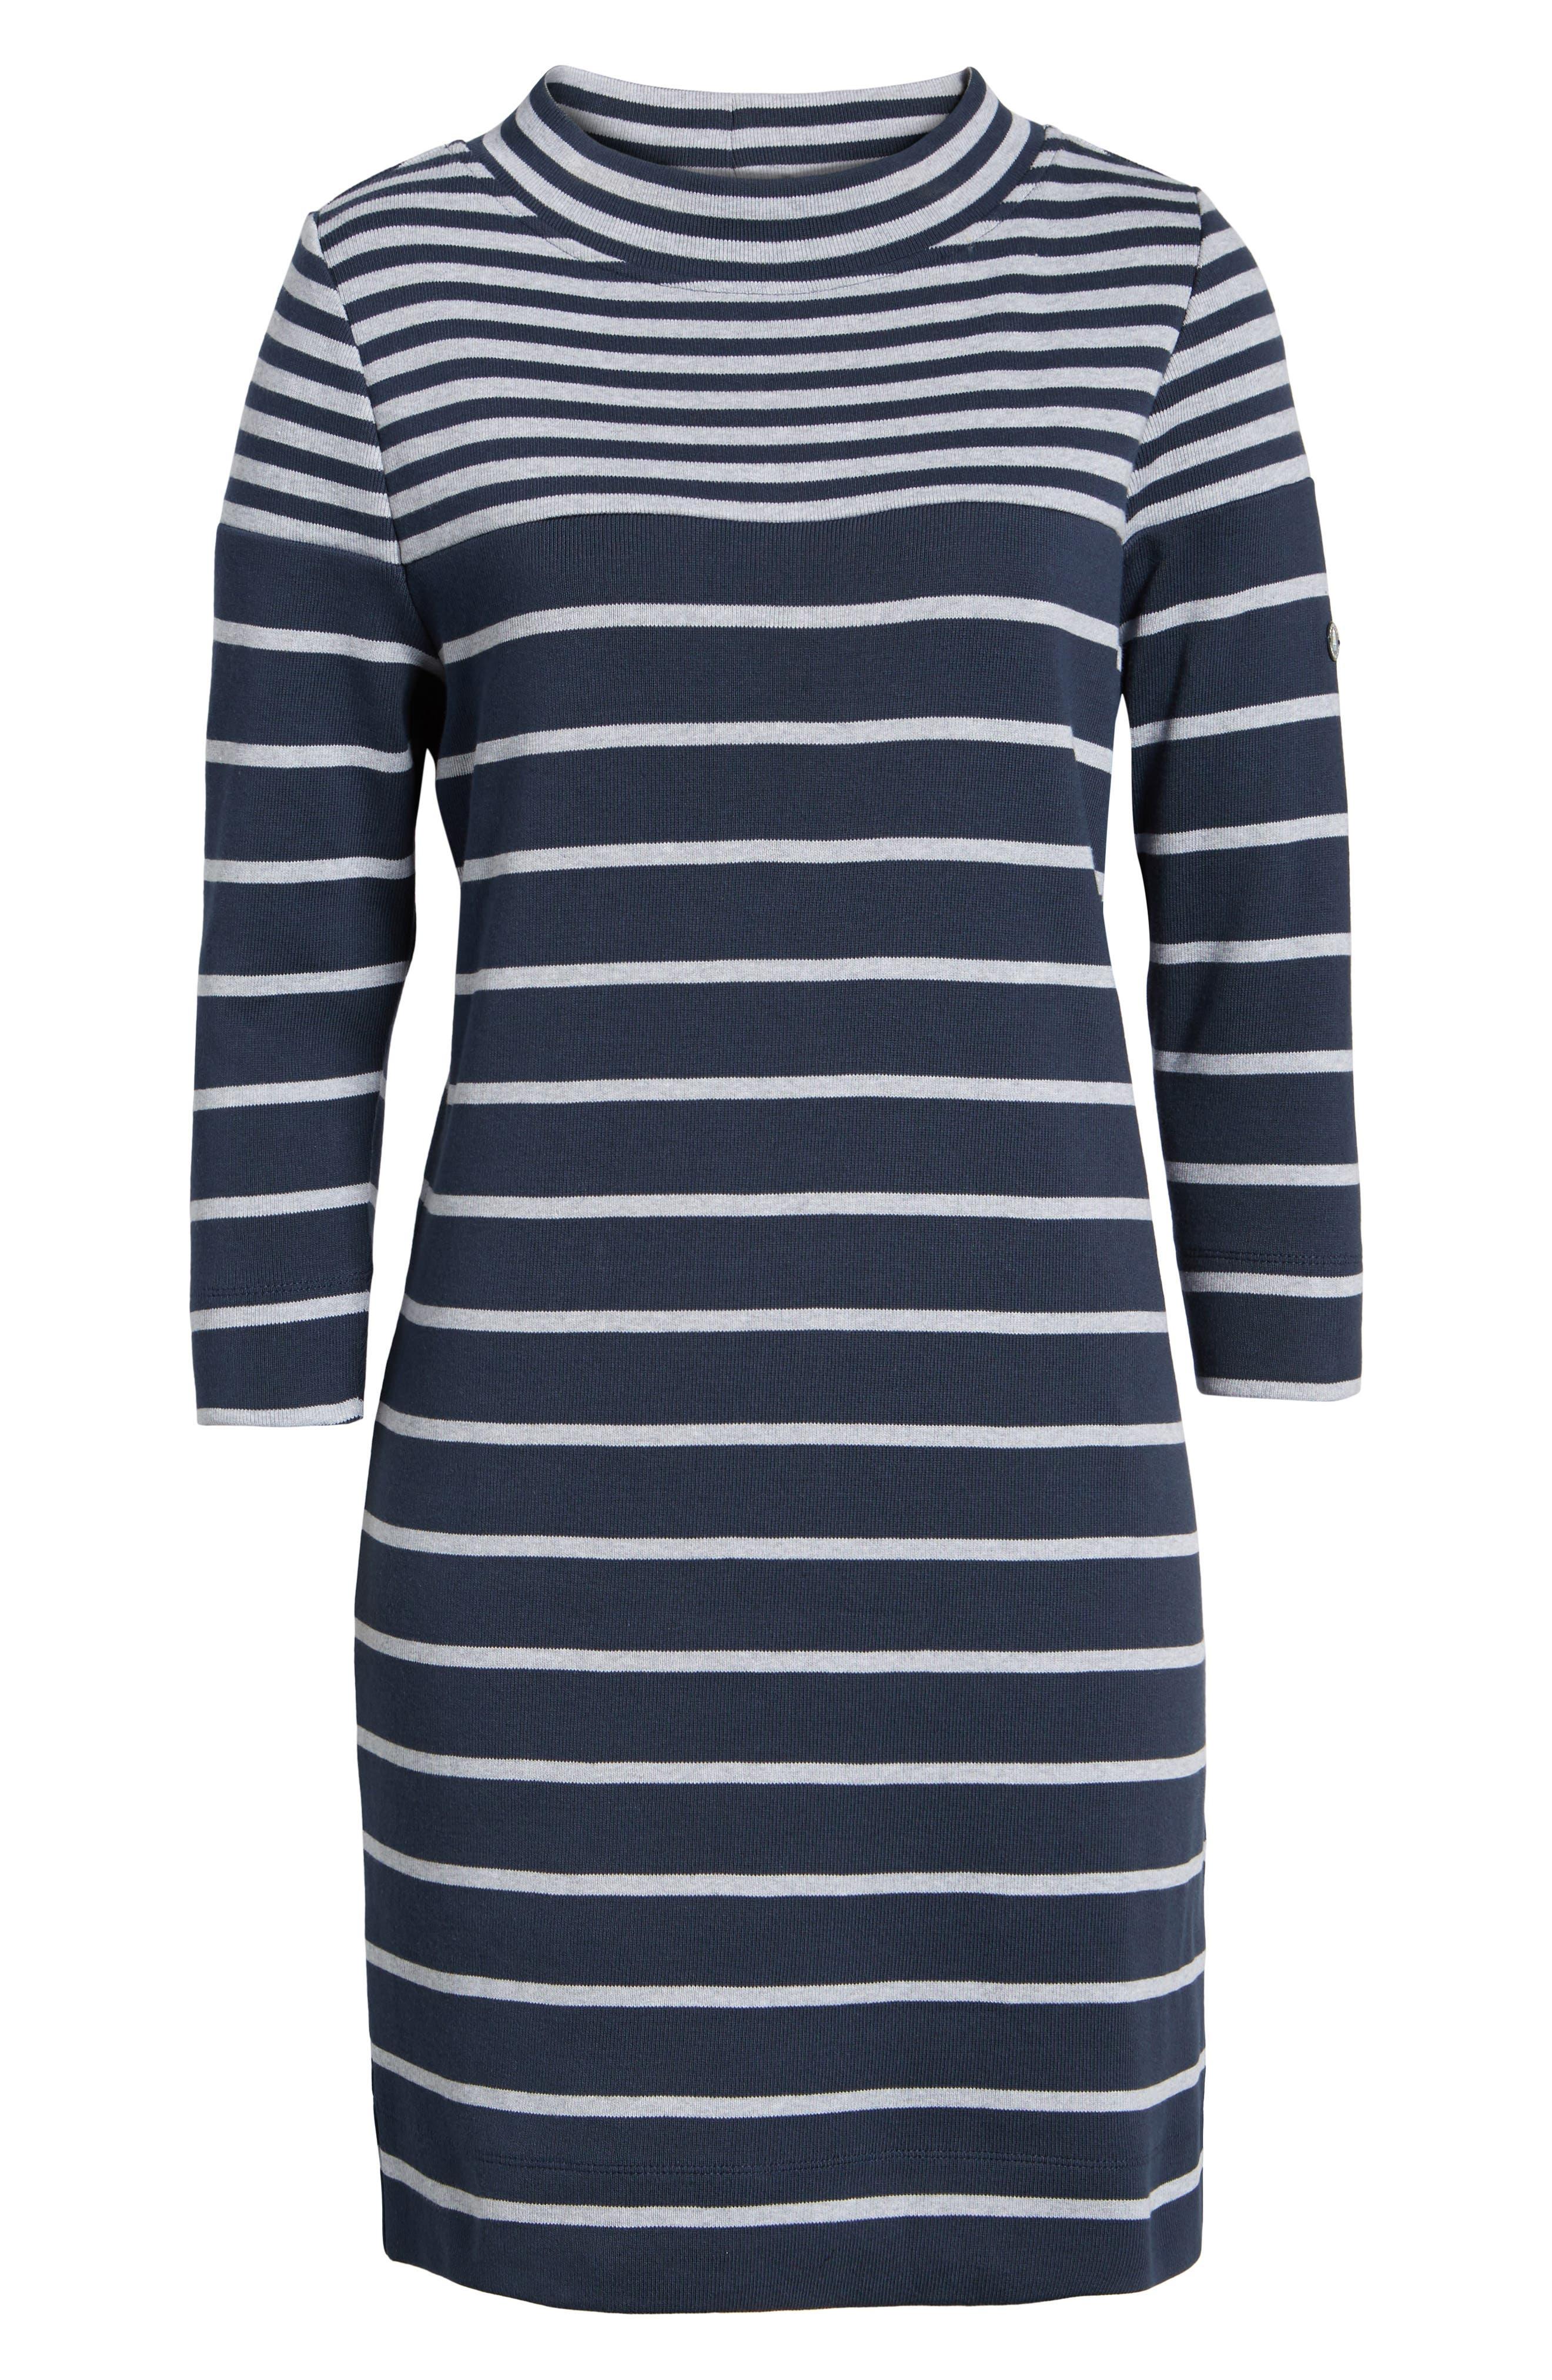 Seaburn Stripe Shift Dress,                             Alternate thumbnail 6, color,                             Navy